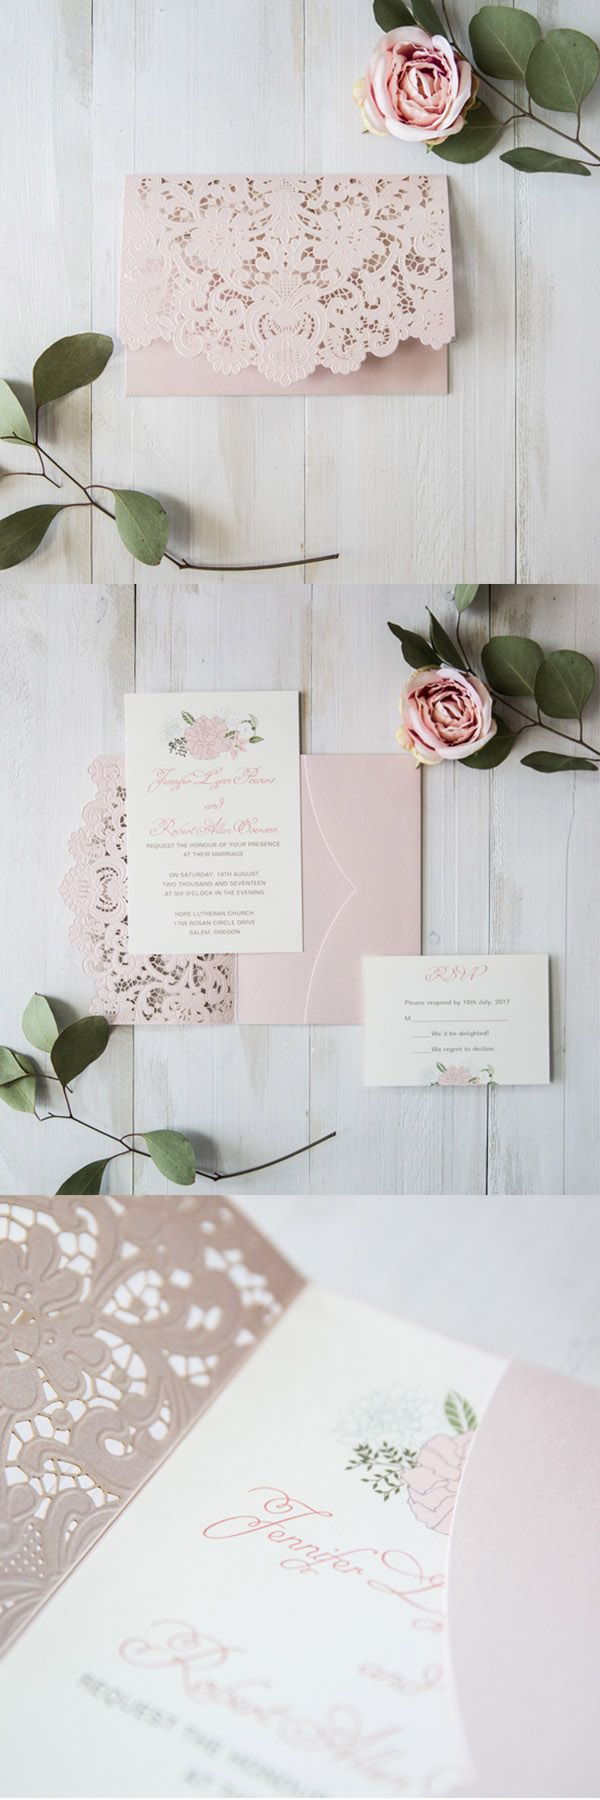 super unique laser cut wedding invitations%0A corporate resignation letter sample